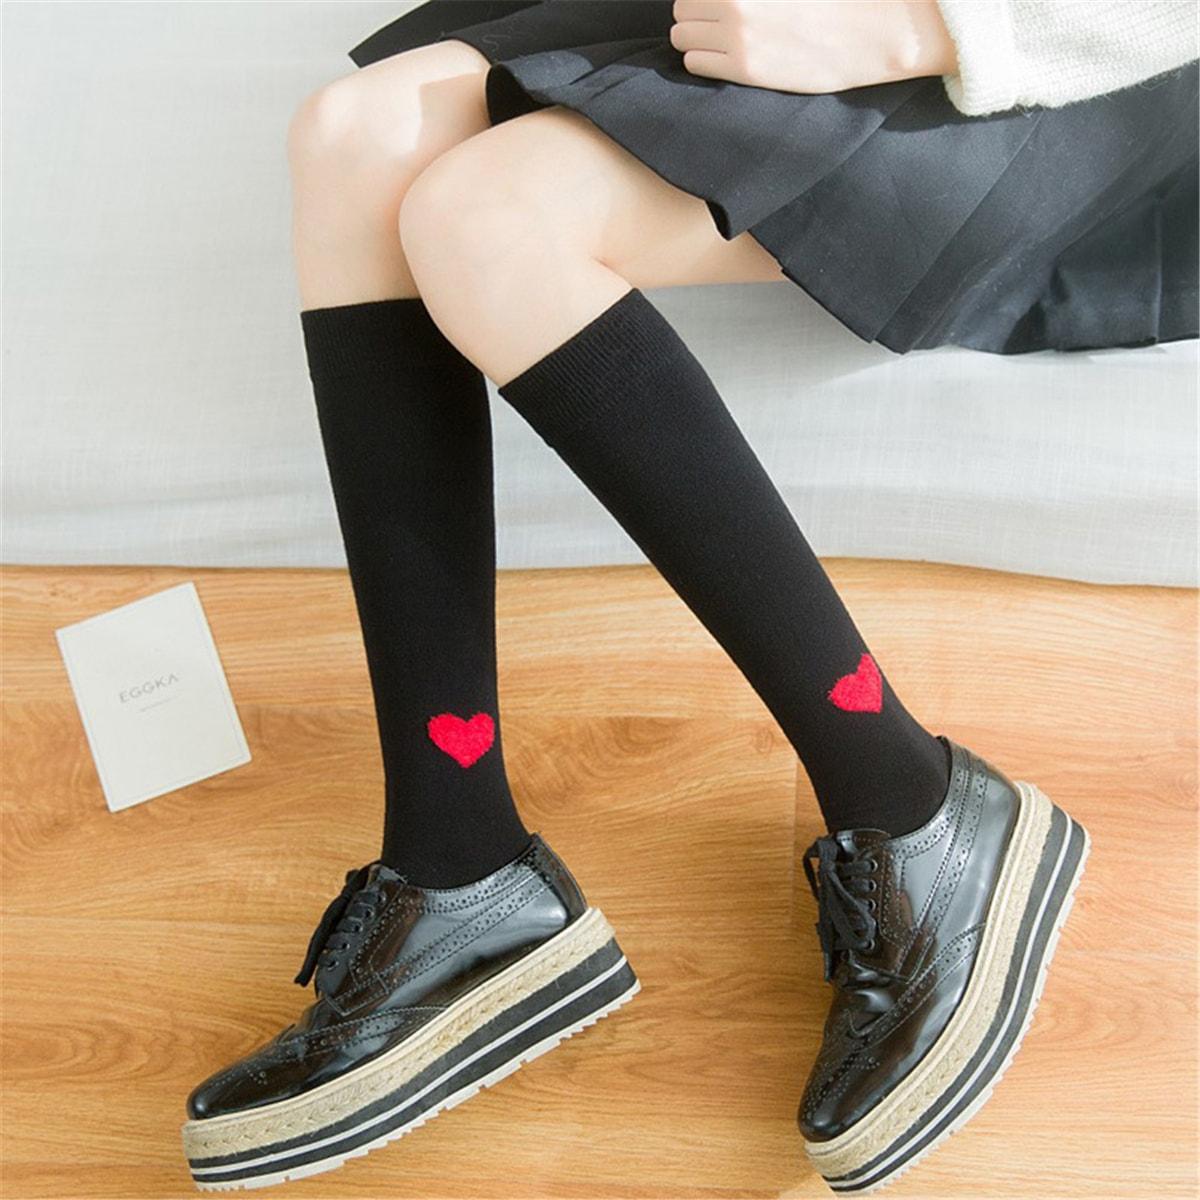 c7c6e1f4d UNIQUEWHO Girls Women Heart Pattern Mid-calf Length Socks Japanese Cotton  Knee Socks School Girl Stockings Black 1 Pair - Yamibuy.com